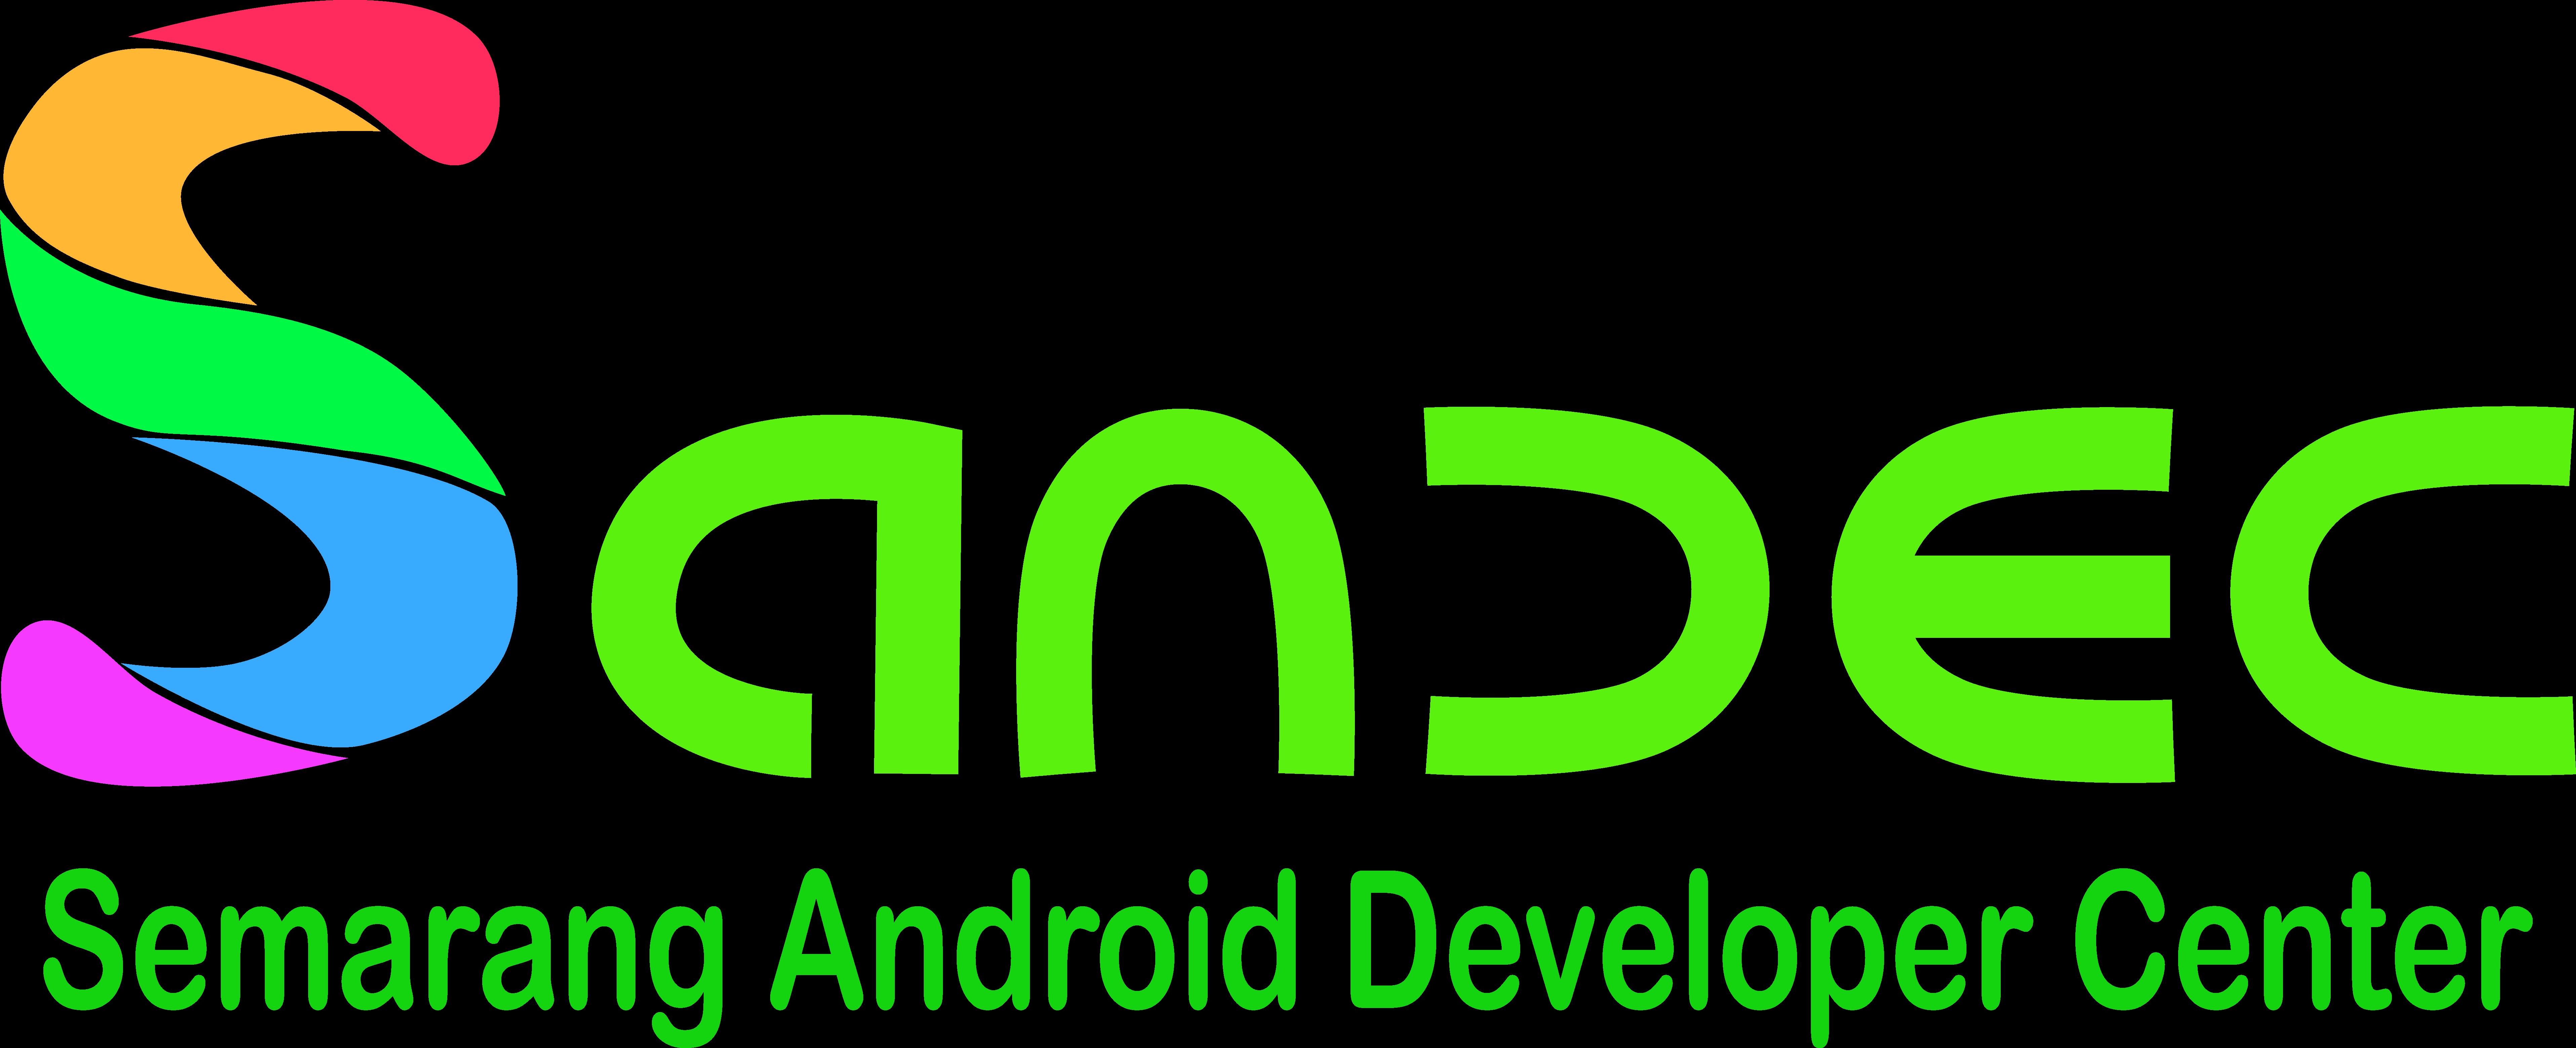 SANDEC Monthly Training #5